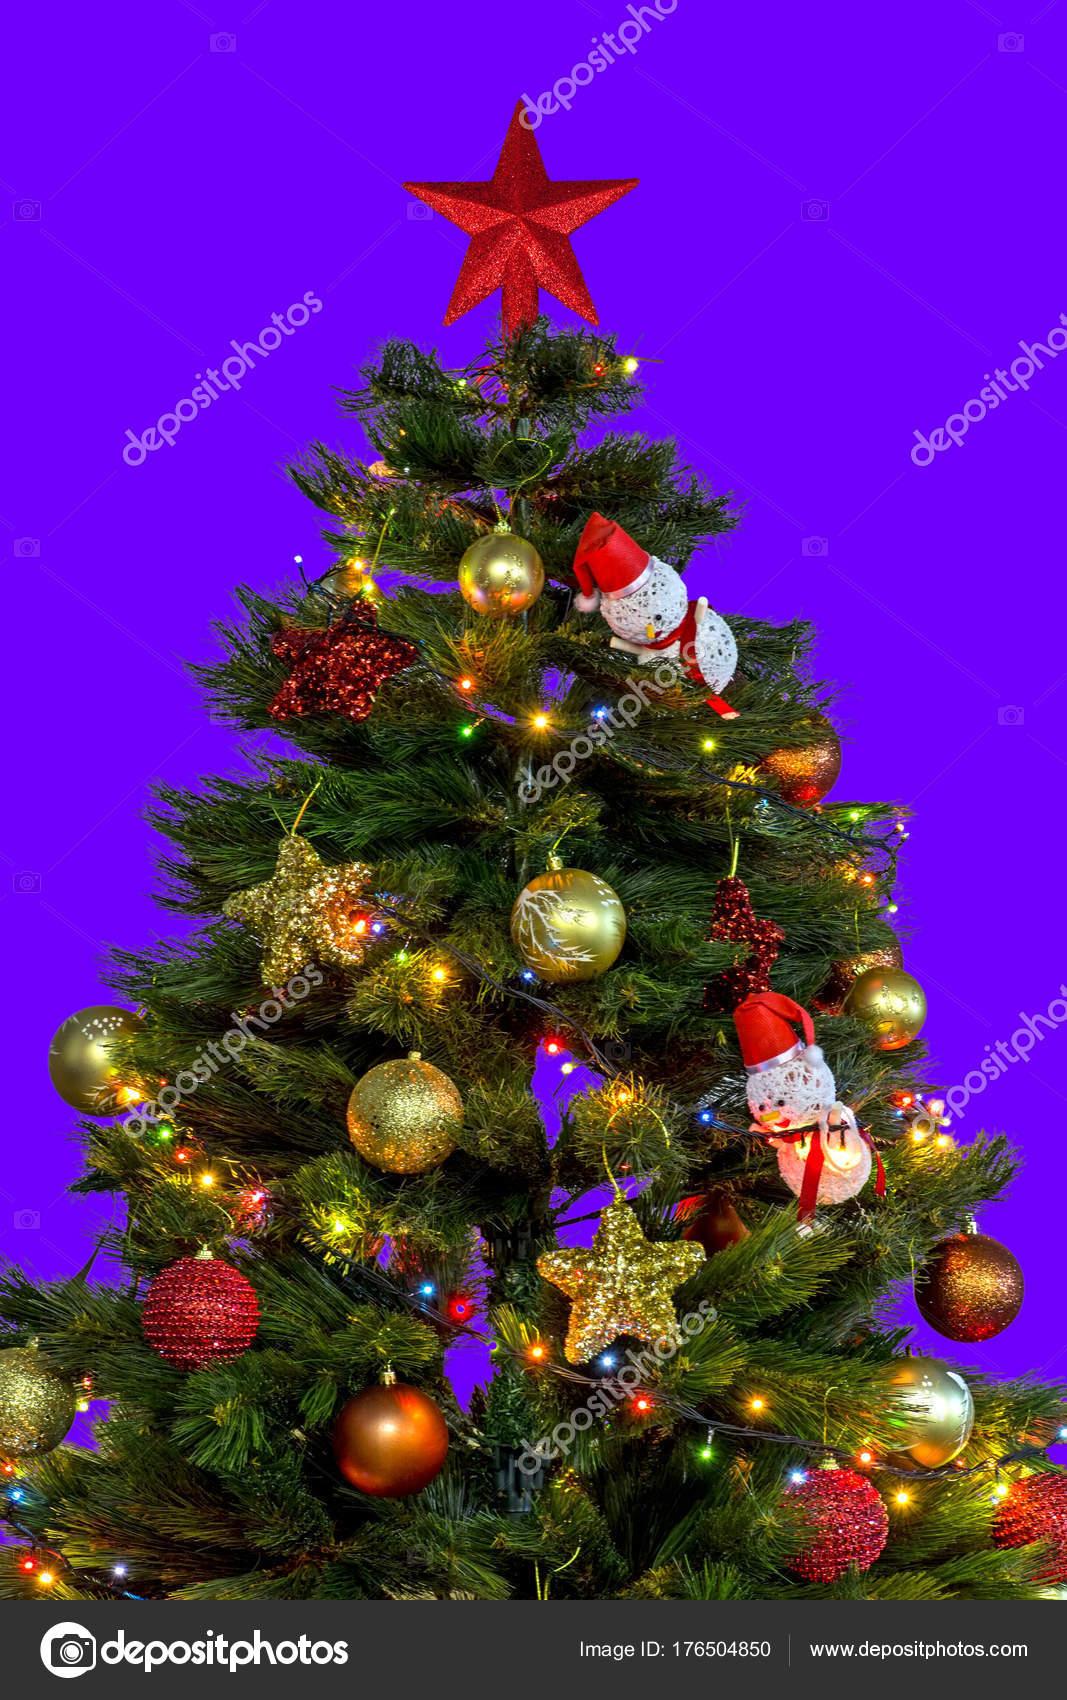 Christmas Tree Big Red Star Top Decoration Lights Small Pendants — Stock Photo